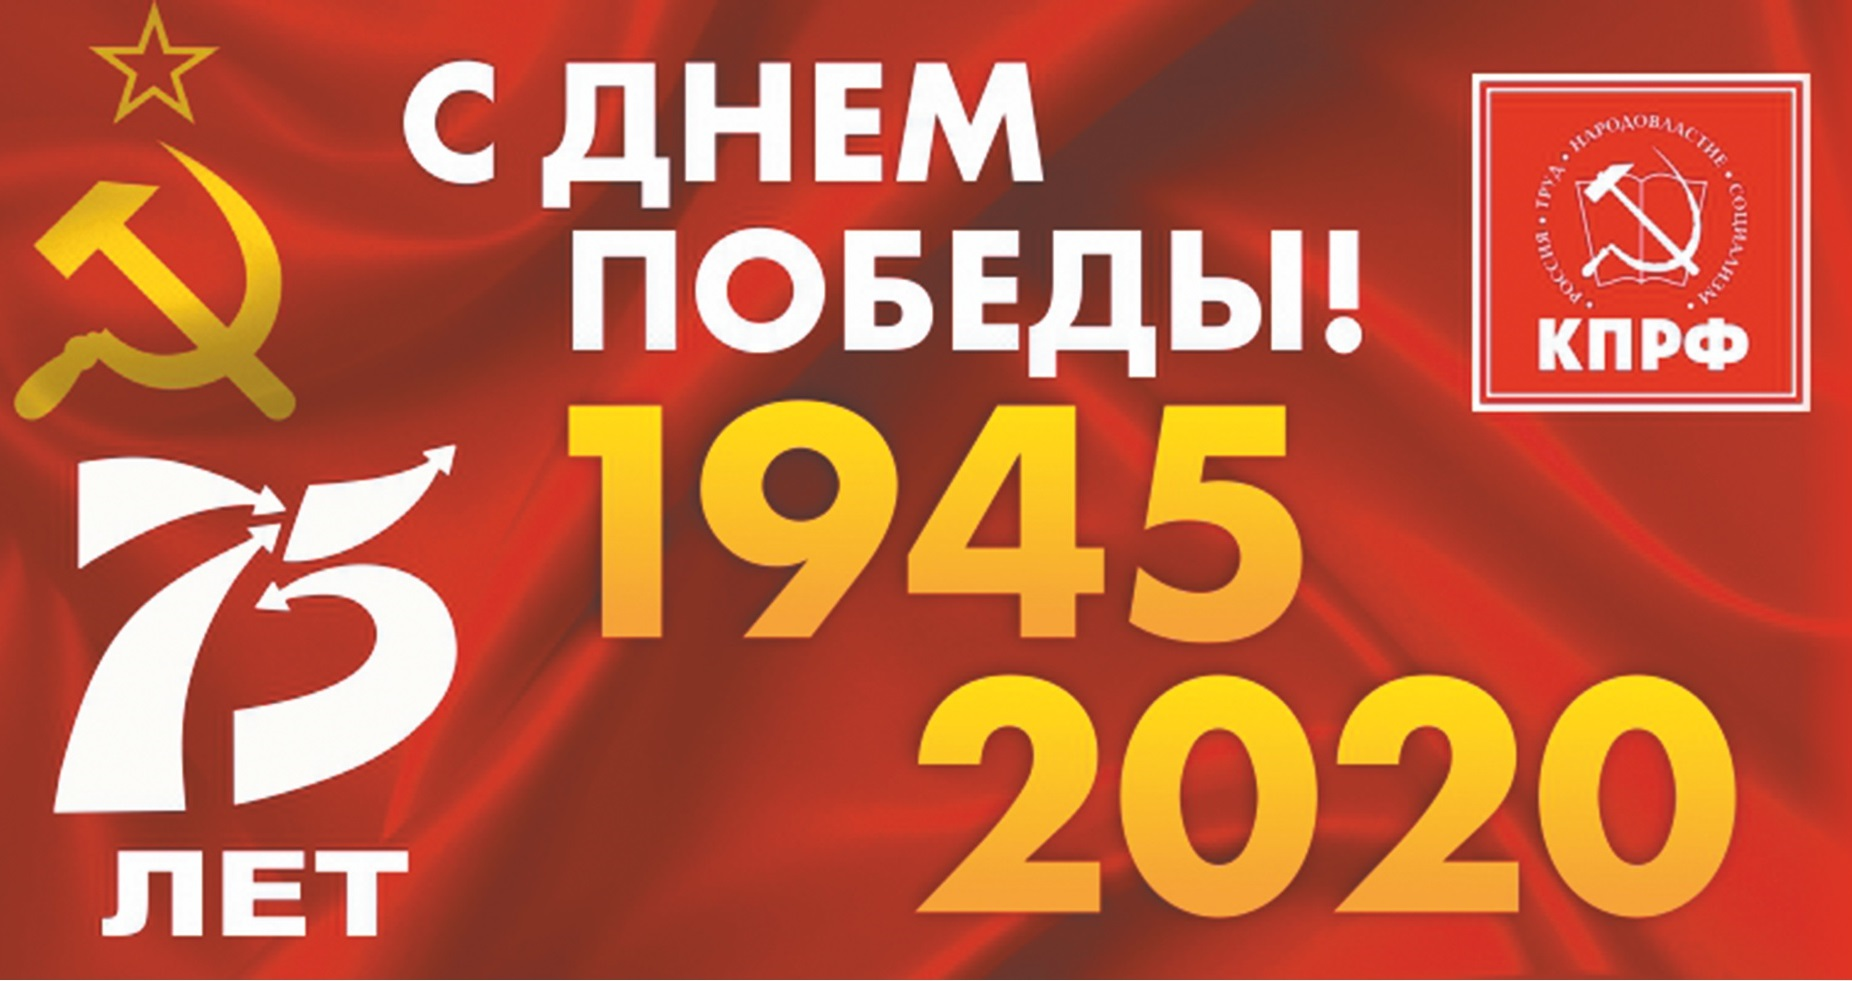 Александр Воробьев: Наше дело правое! Победа будет за нами!